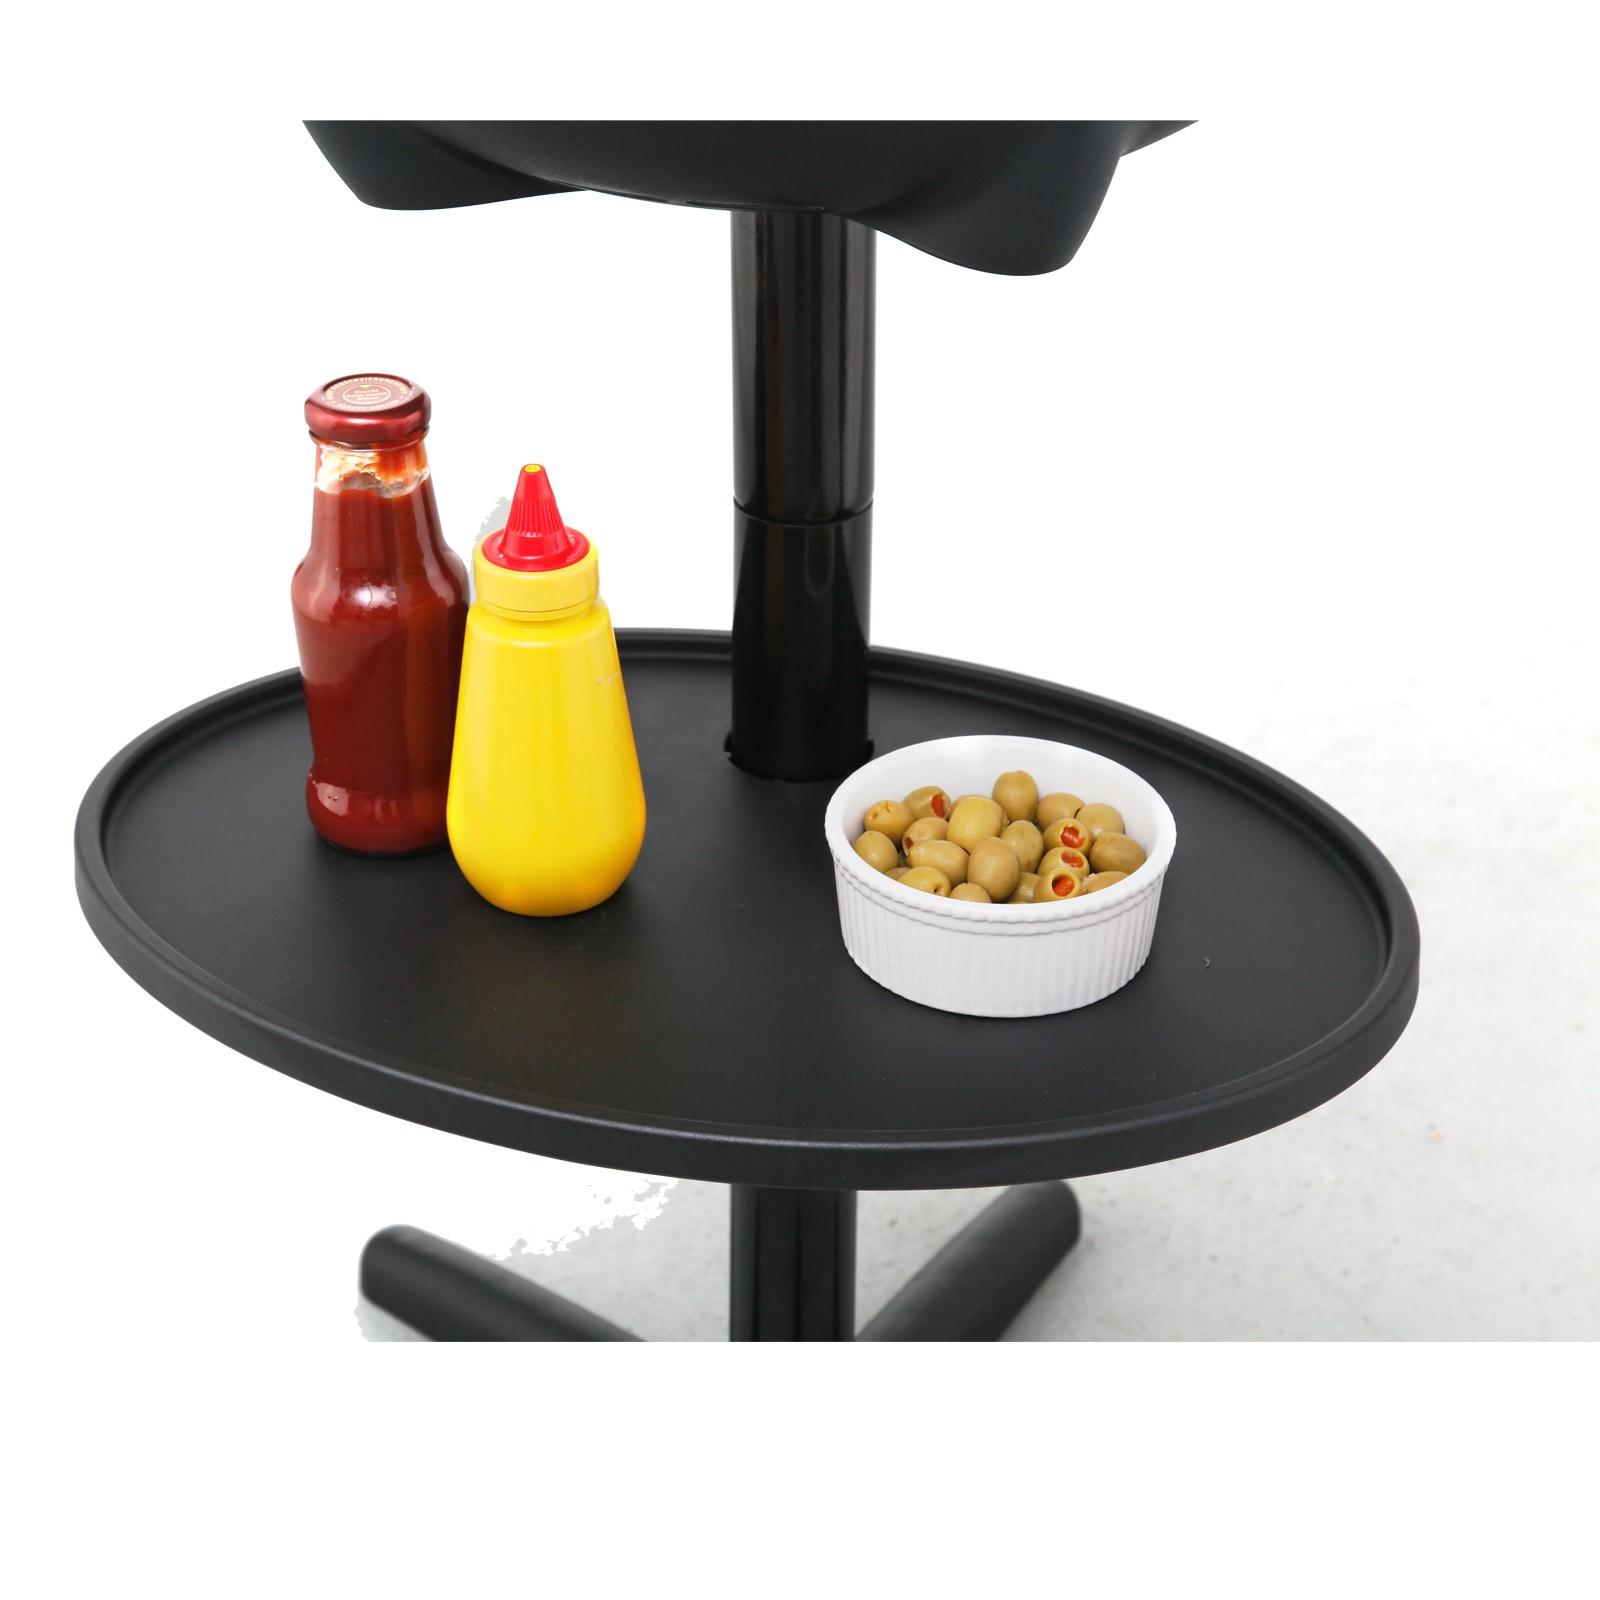 tepro elektrokugelgrill minigrill partygrill bbq grill elektrogrill mini elgin ebay. Black Bedroom Furniture Sets. Home Design Ideas